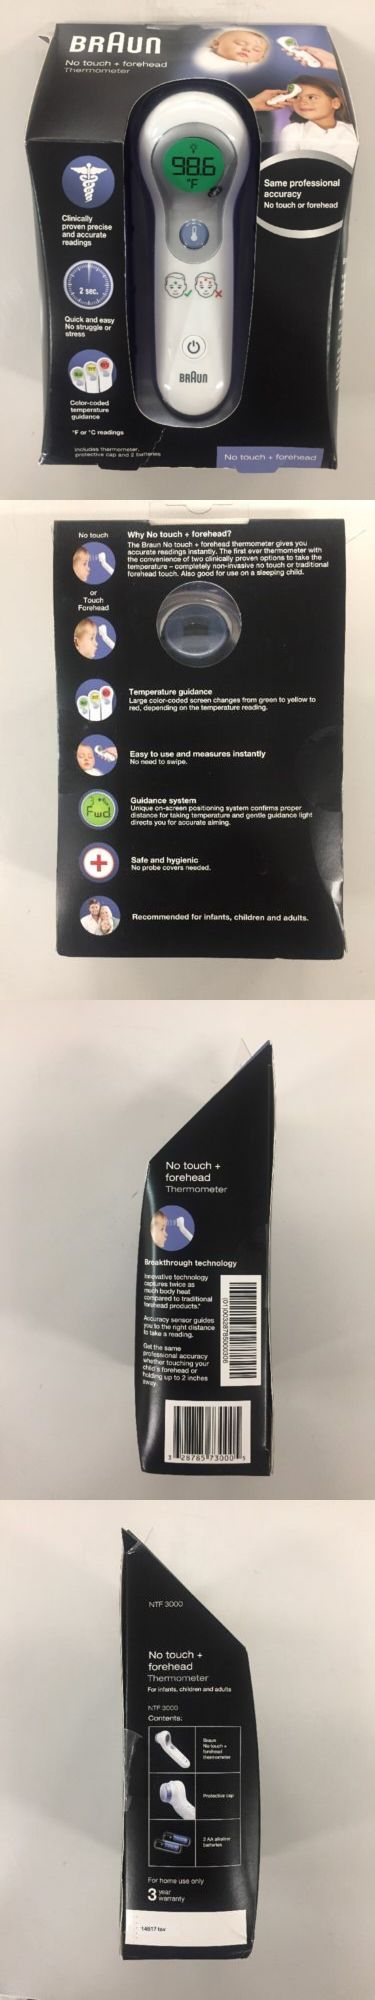 Taft Florida Oval Bumper Sticker or Helmet Sticker D1541 Euro Oval